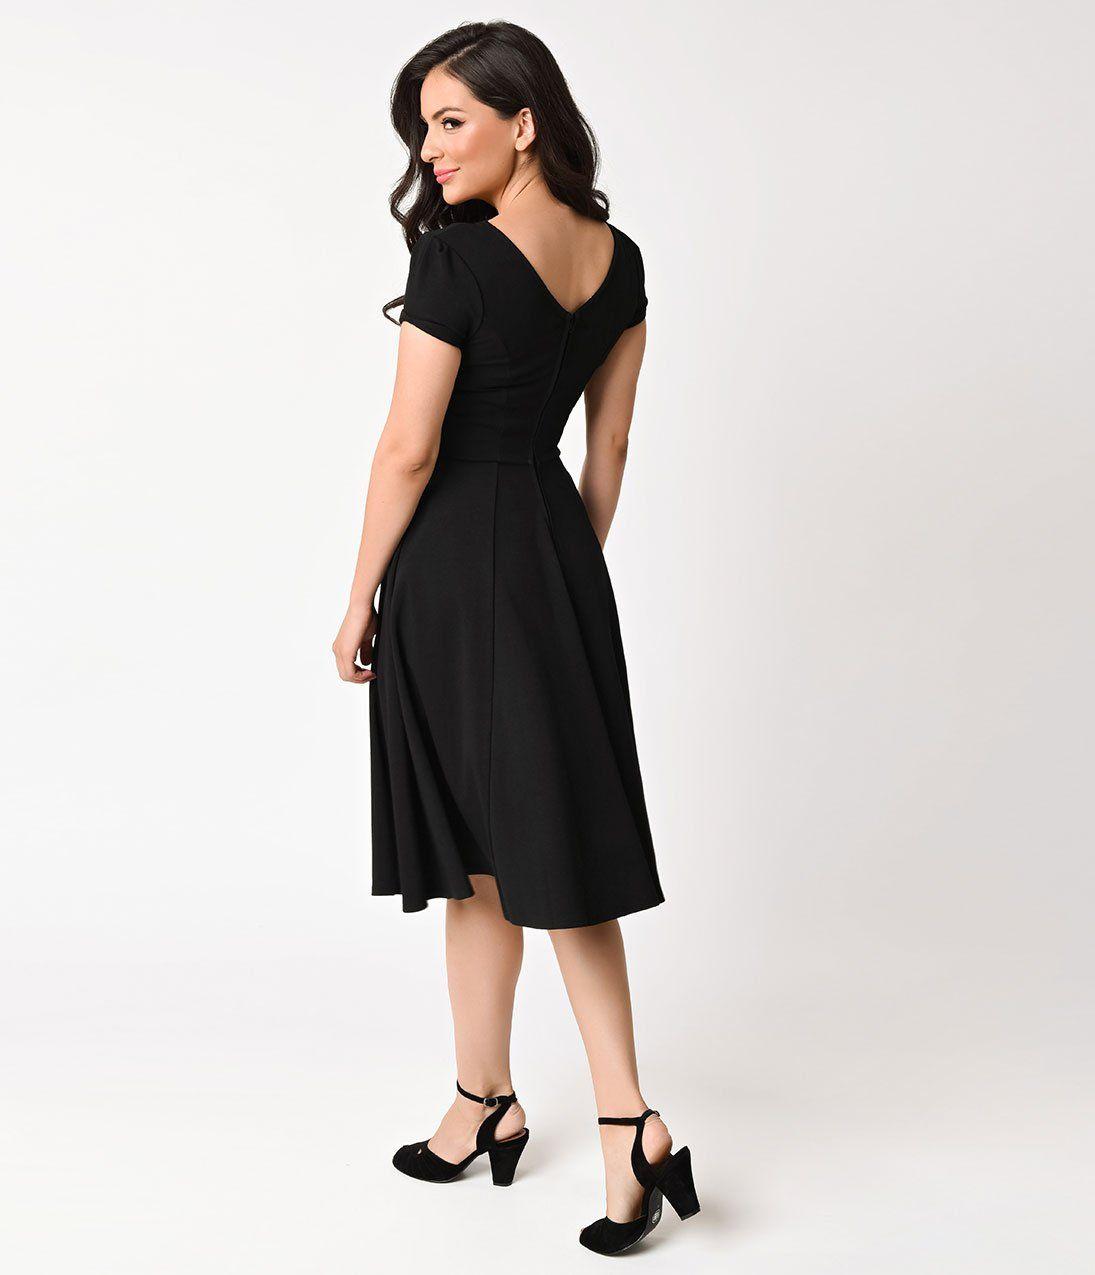 Plus size s style black knit short sleeve natalie swing dress